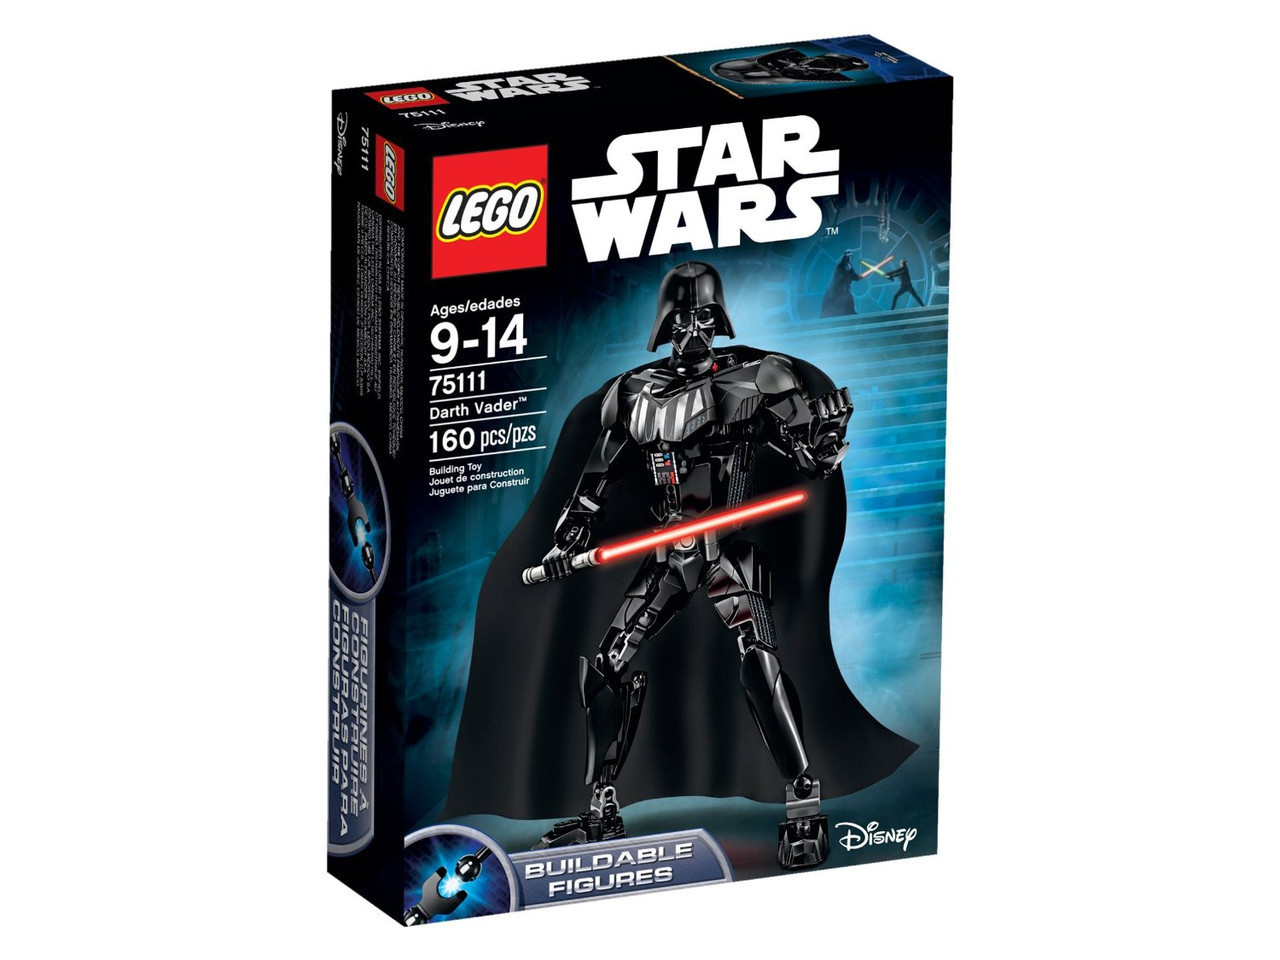 Lego Star Wars Дарт Вейдер 75111